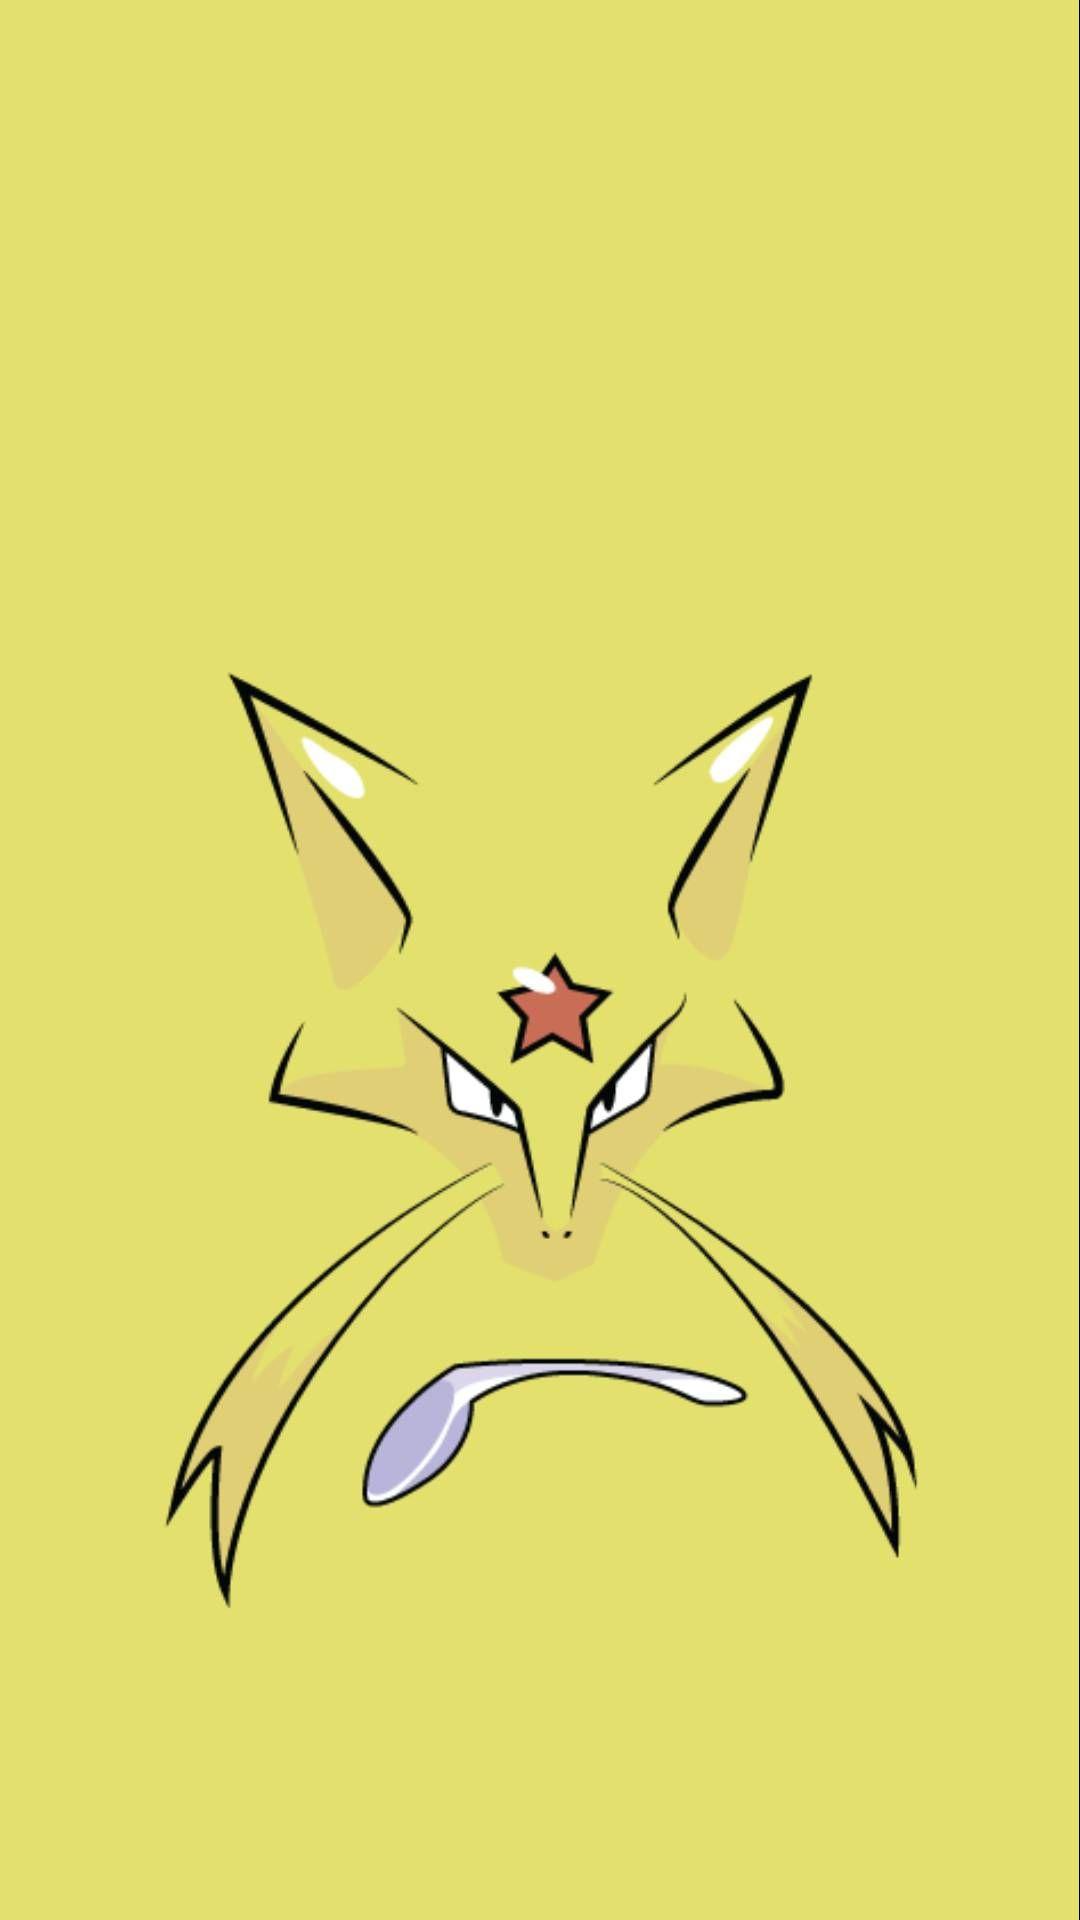 Pokemon Minimalist iPhone x wallpaper